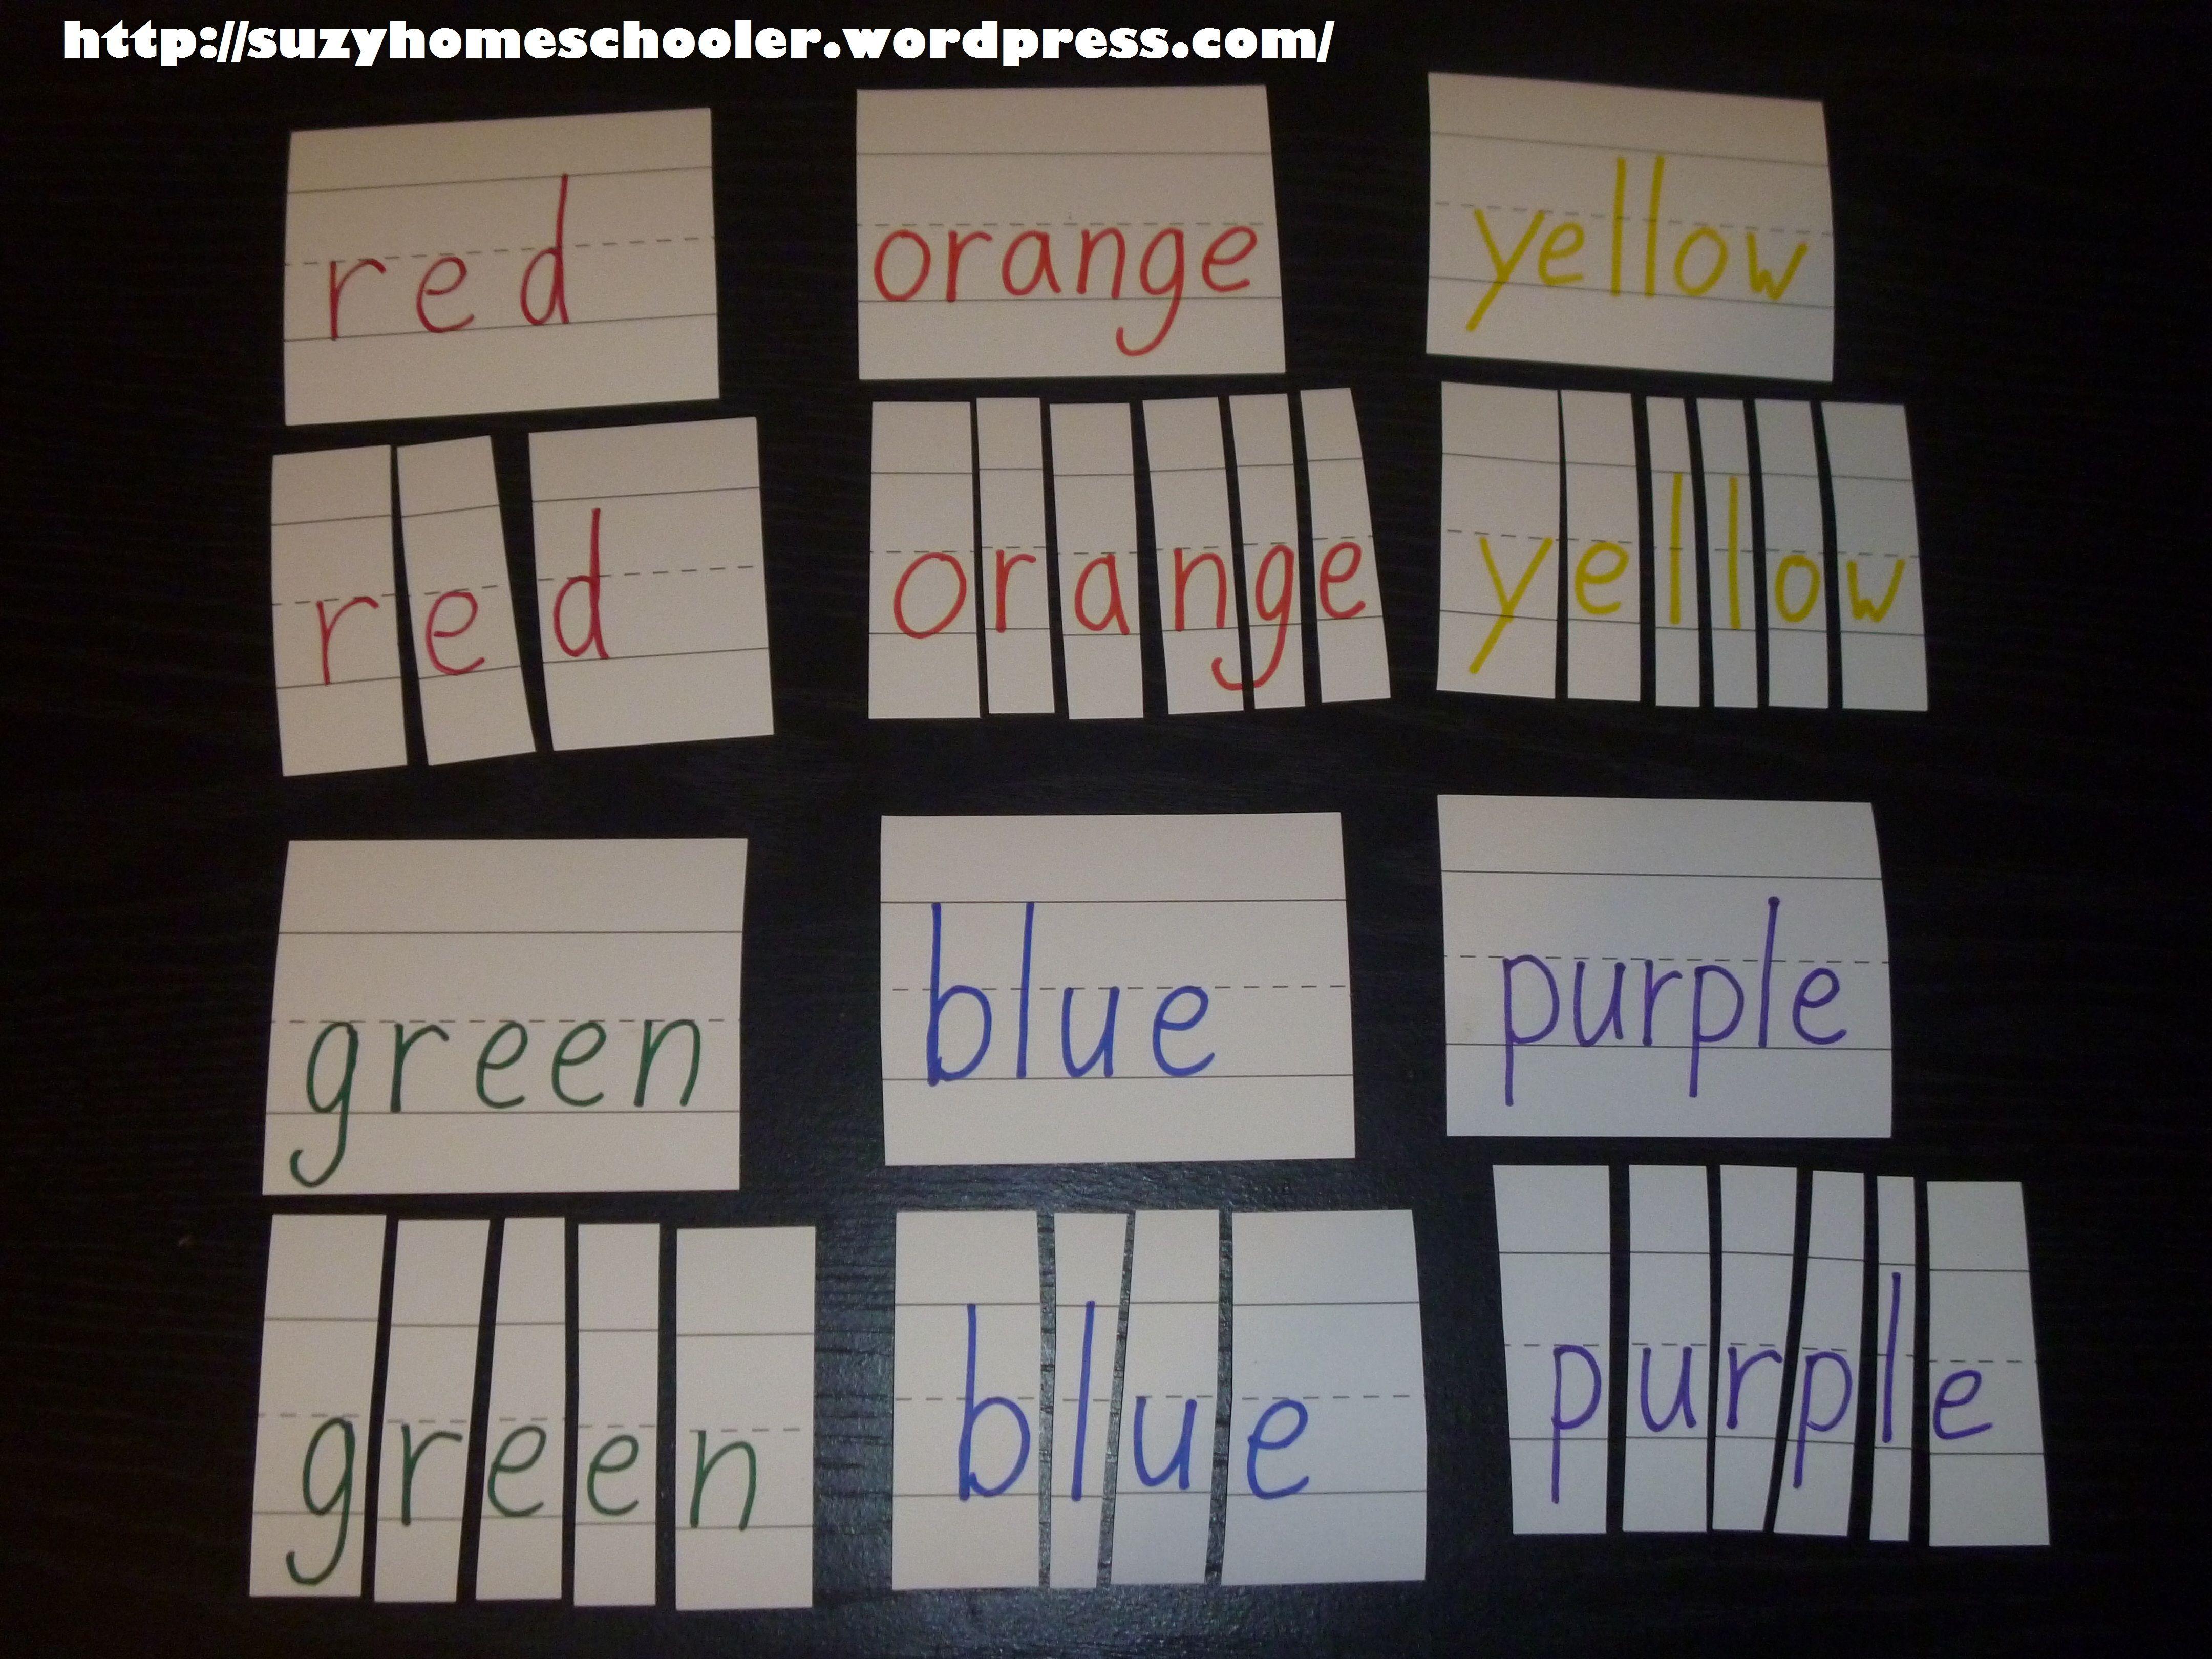 Preschool Box Lessons For Rainbow Theme Week From Suzy Homeschooler 6 4 320 3 240 Pixels